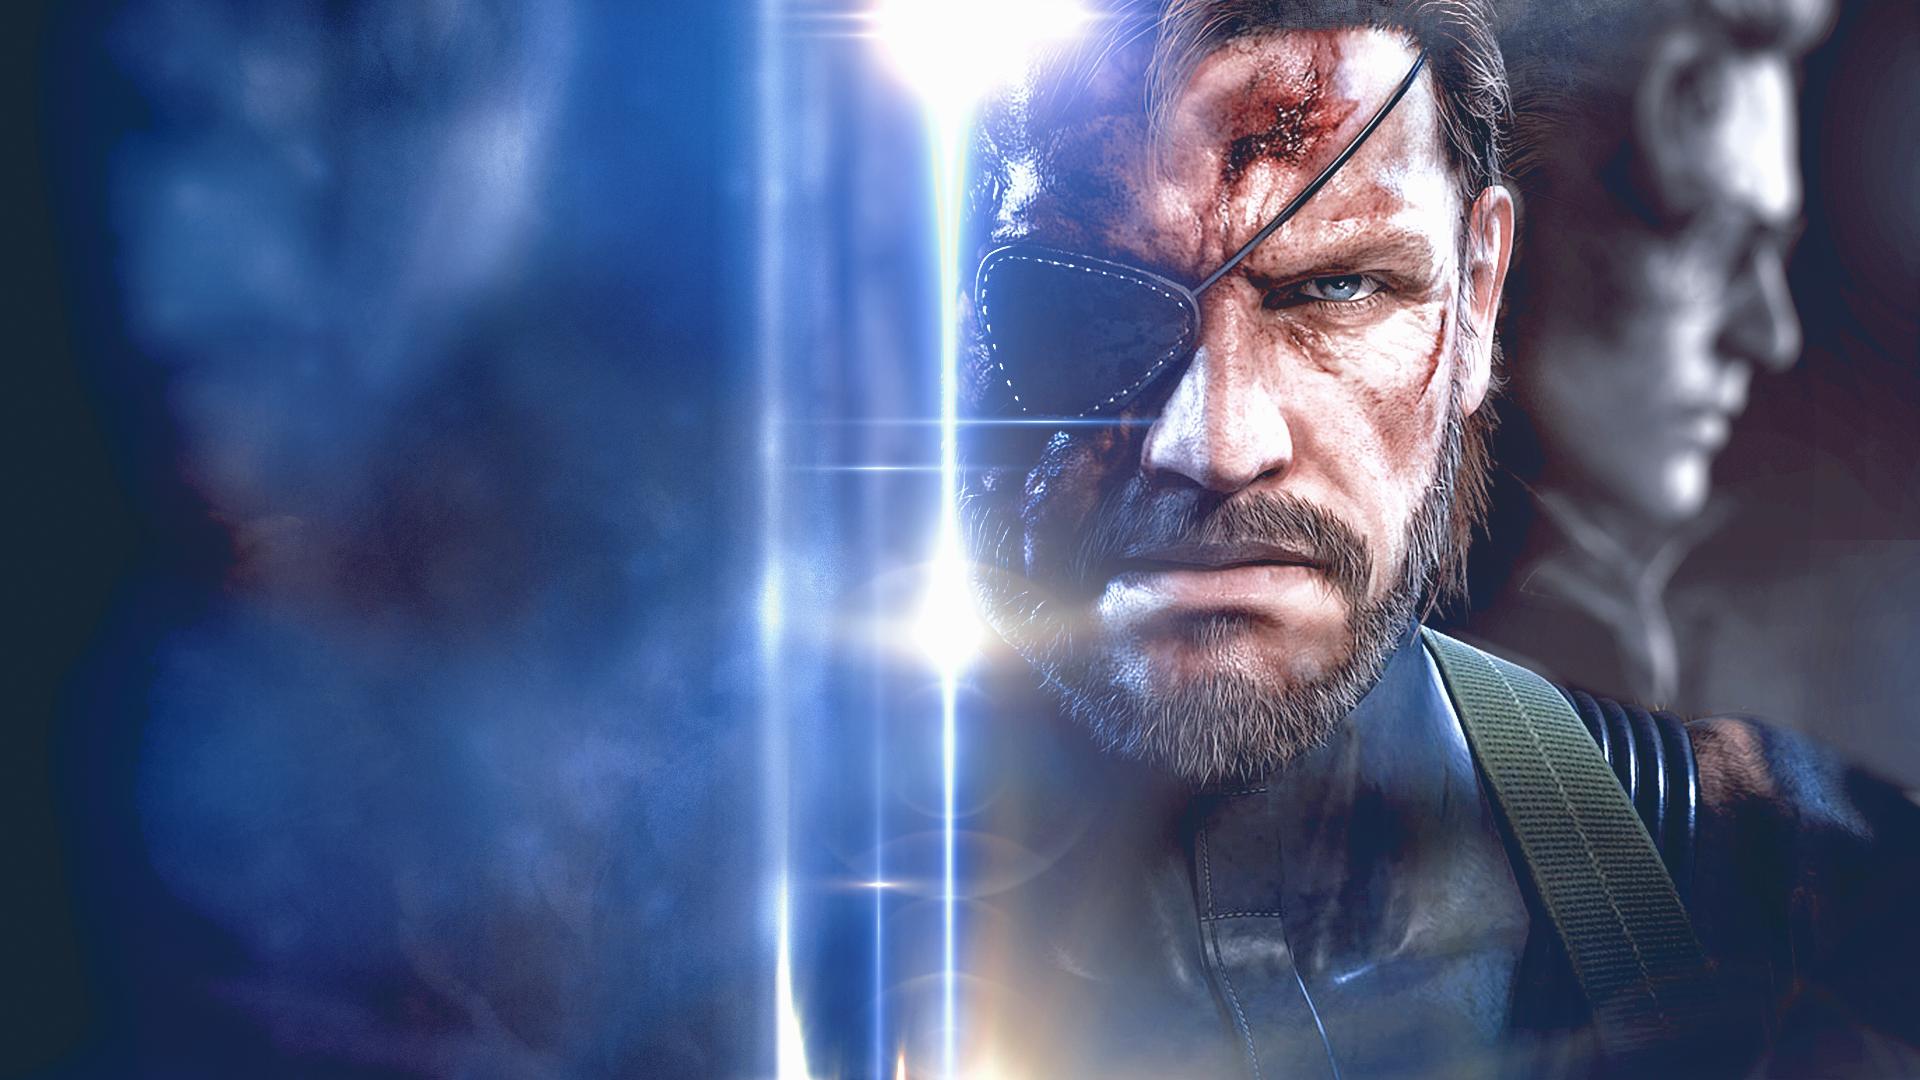 Wallpaper Video Games Metal Gear Solid Metal Gear Metal